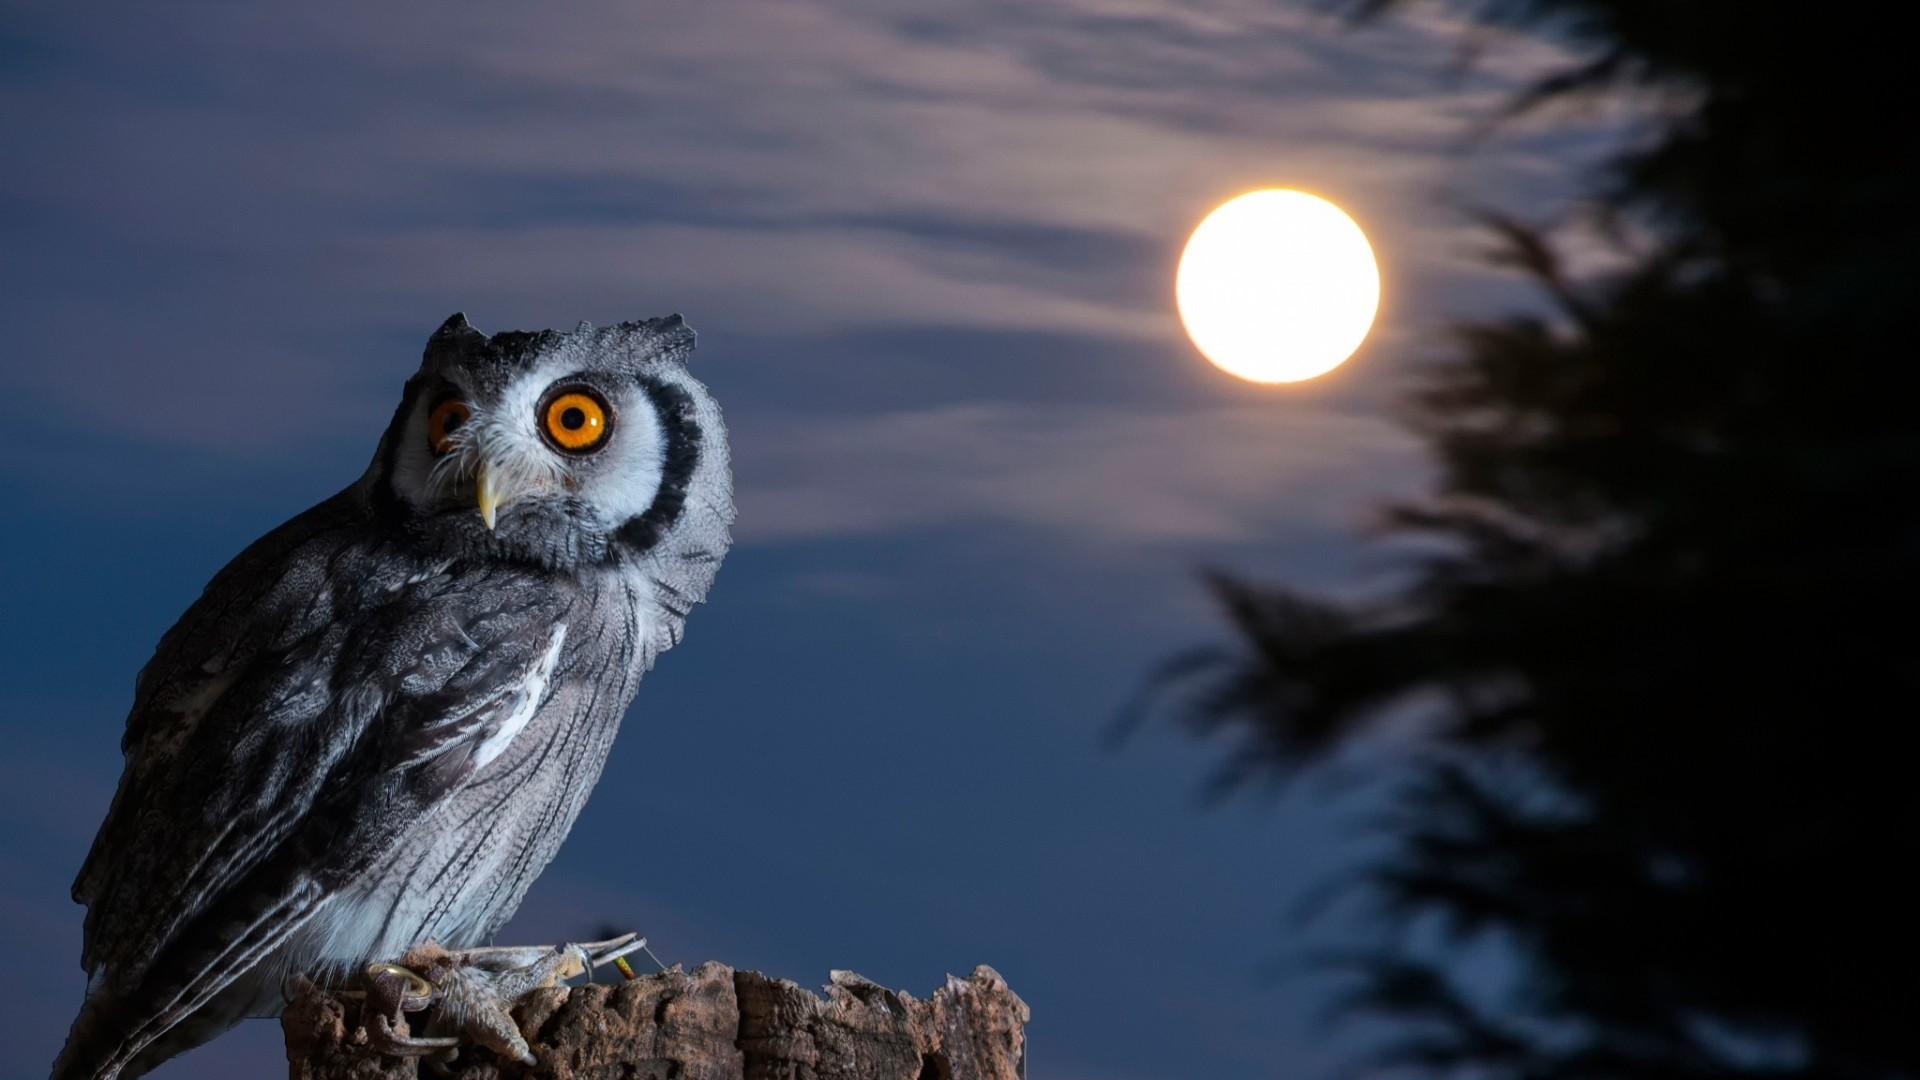 night owl moon hd wallpaper desktop wallpapers 4k high definition windows  10 mac apple colourful images